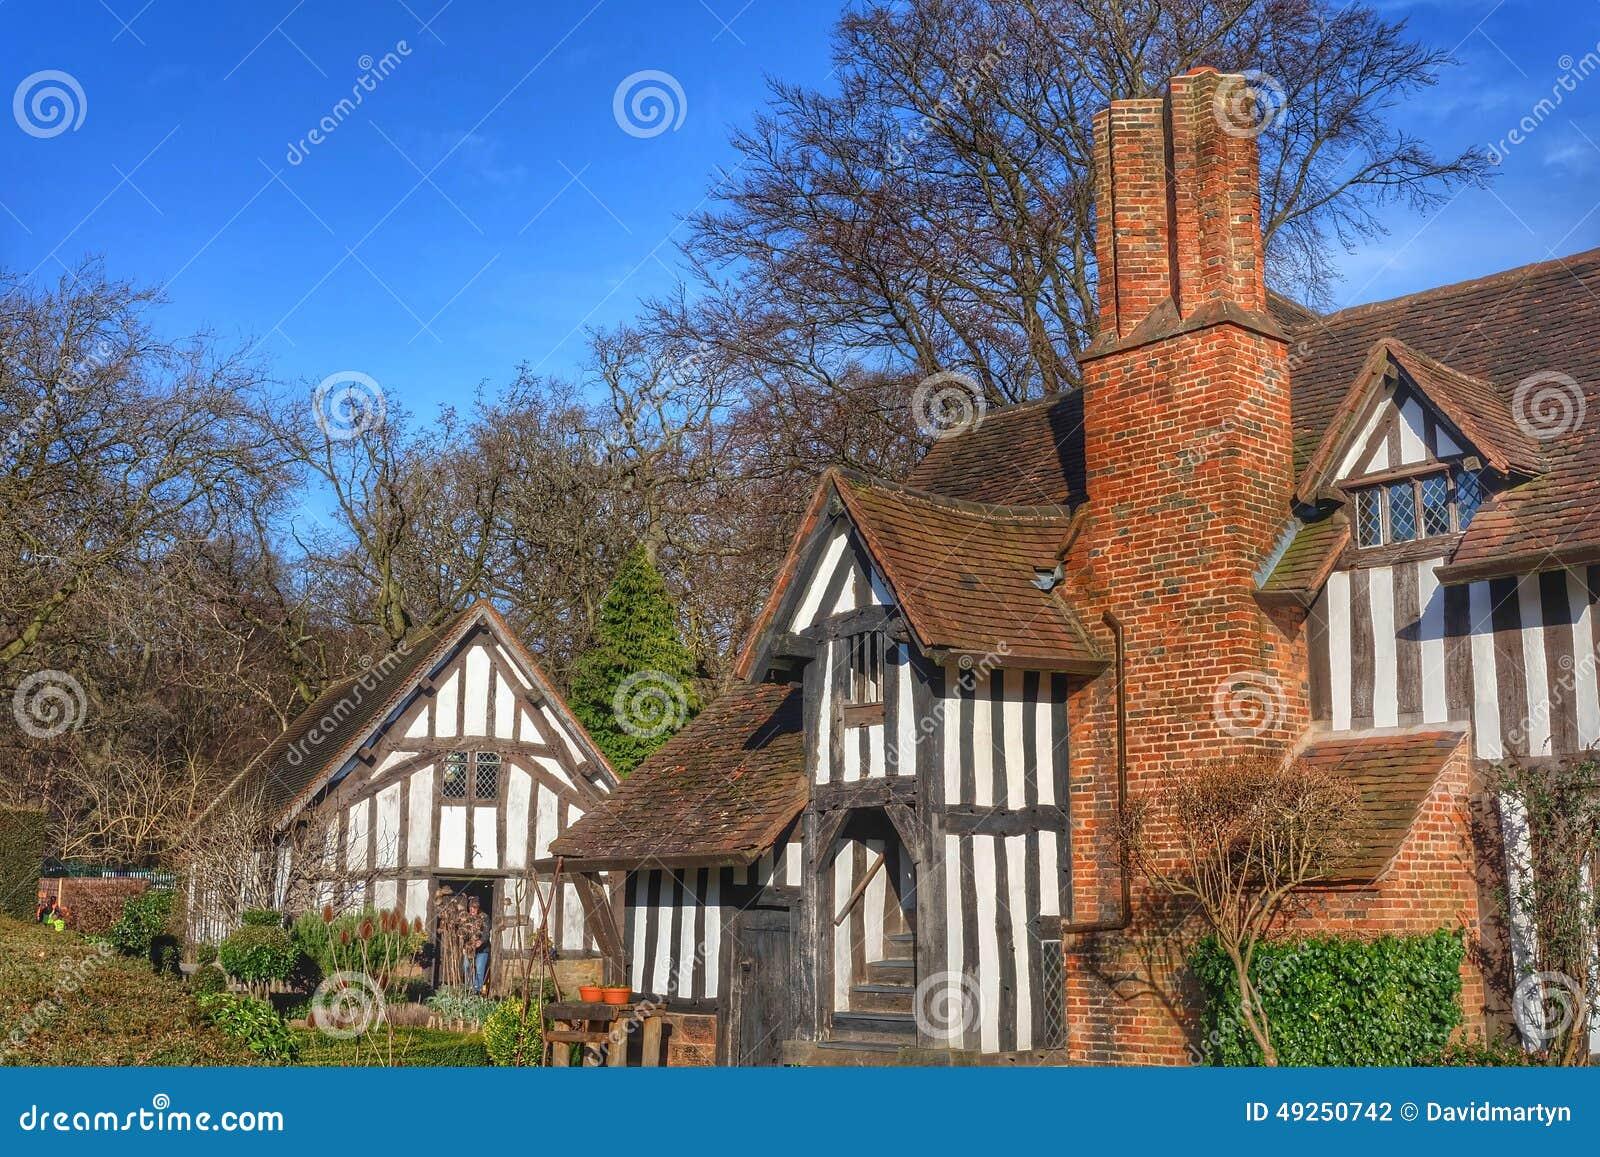 Old House Stock Photo - Image: 49250742